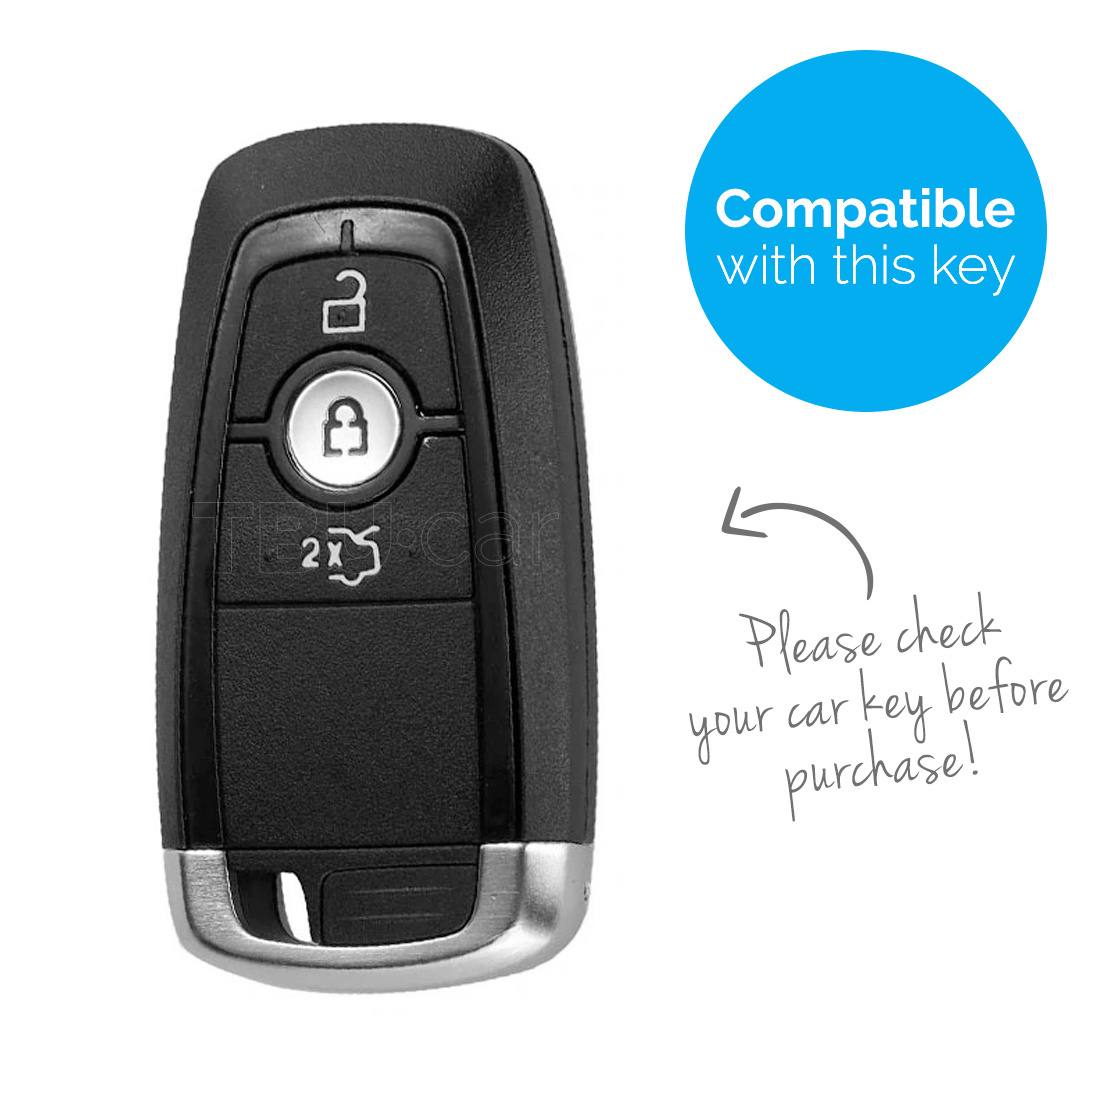 TBU car Autoschlüssel Hülle für Ford 3 Tasten (Keyless Entry) - Schutzhülle aus Silikon - Auto Schlüsselhülle Cover in Rosa